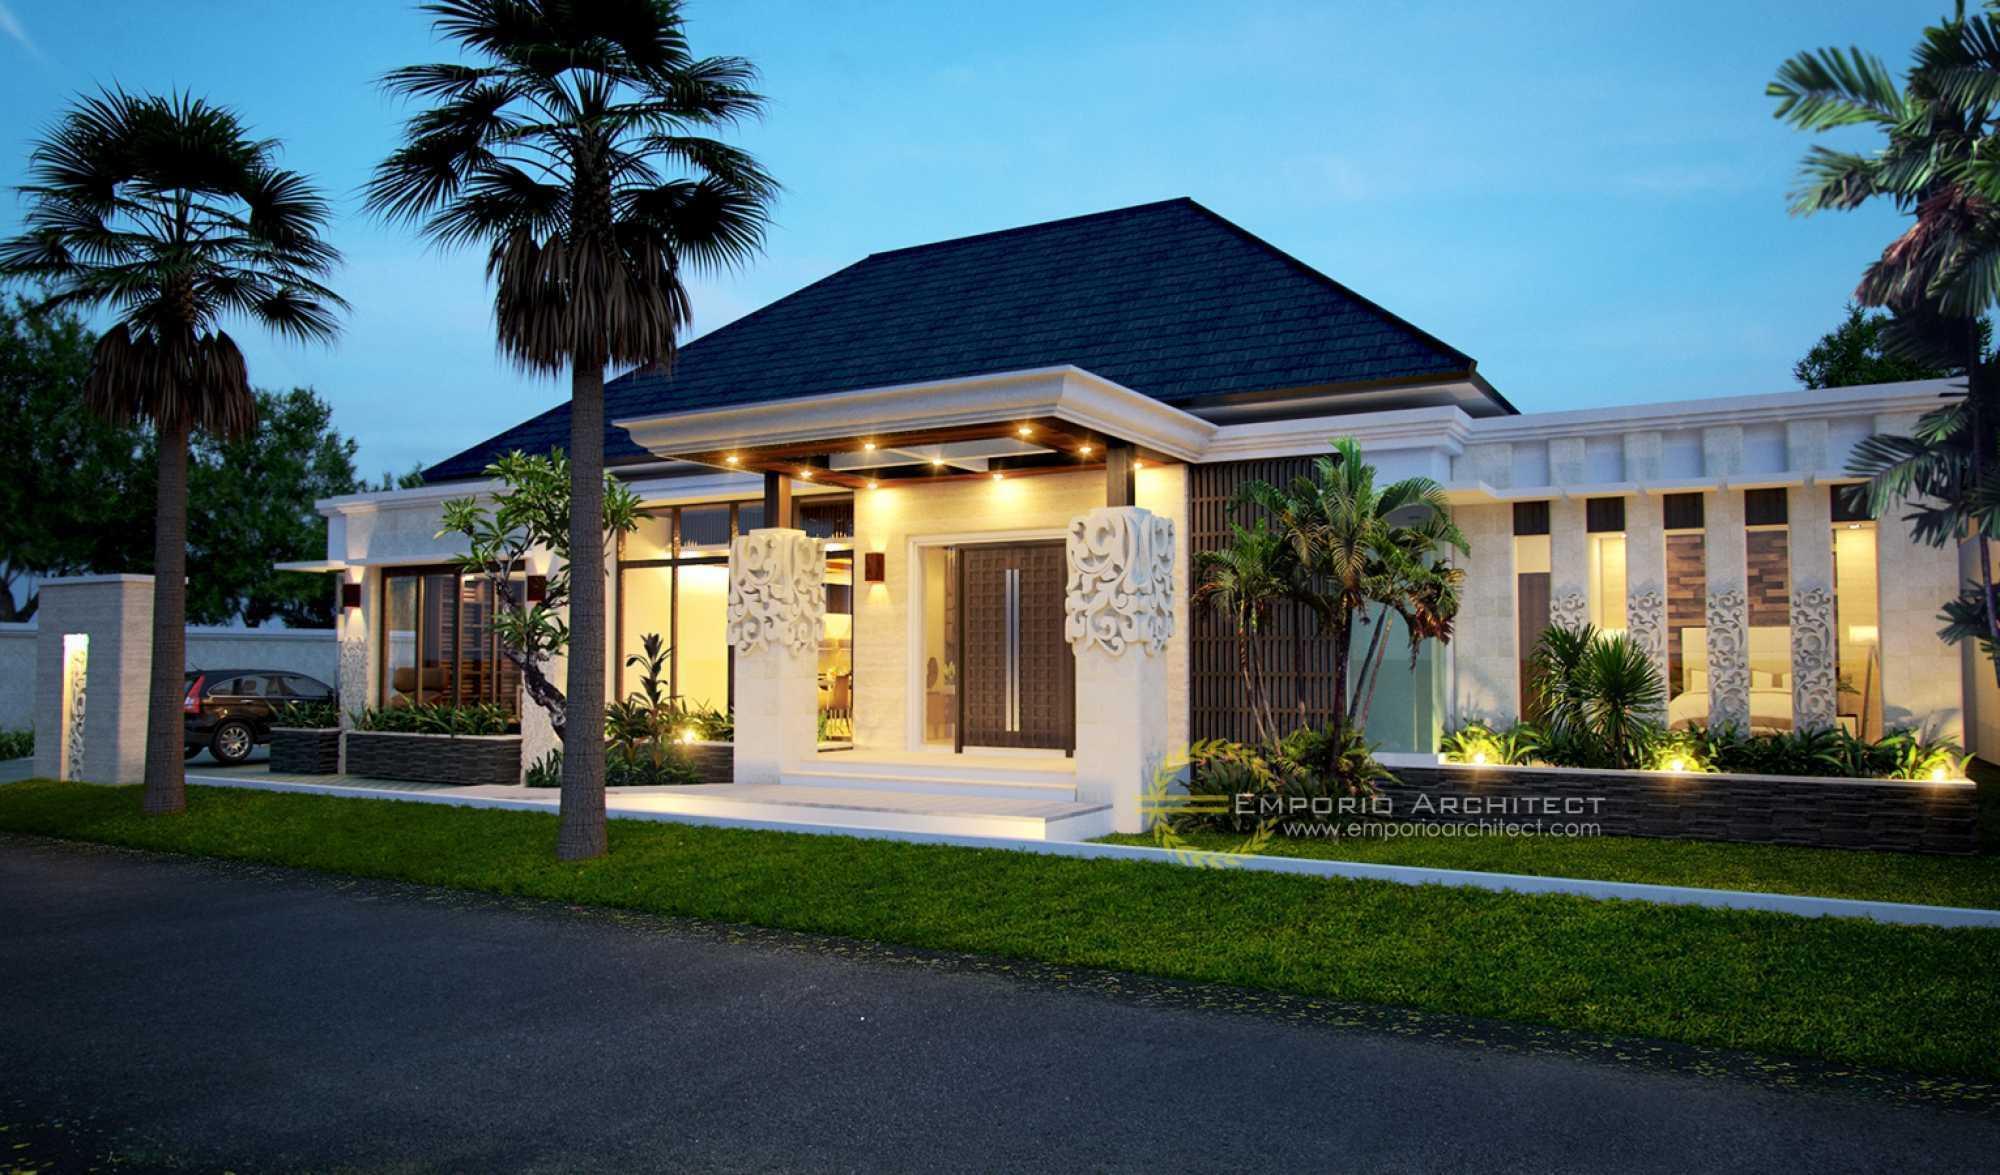 Emporio Architect Desain Rumah Villa Bali Tropis 233 @ Bekasi Bekasi, Kota Bks, Jawa Barat, Indonesia Bekasi, Kota Bks, Jawa Barat, Indonesia Emporio-Architect-Desain-Rumah-Villa-Bali-Tropis-233-Bekasi Tropical 73040